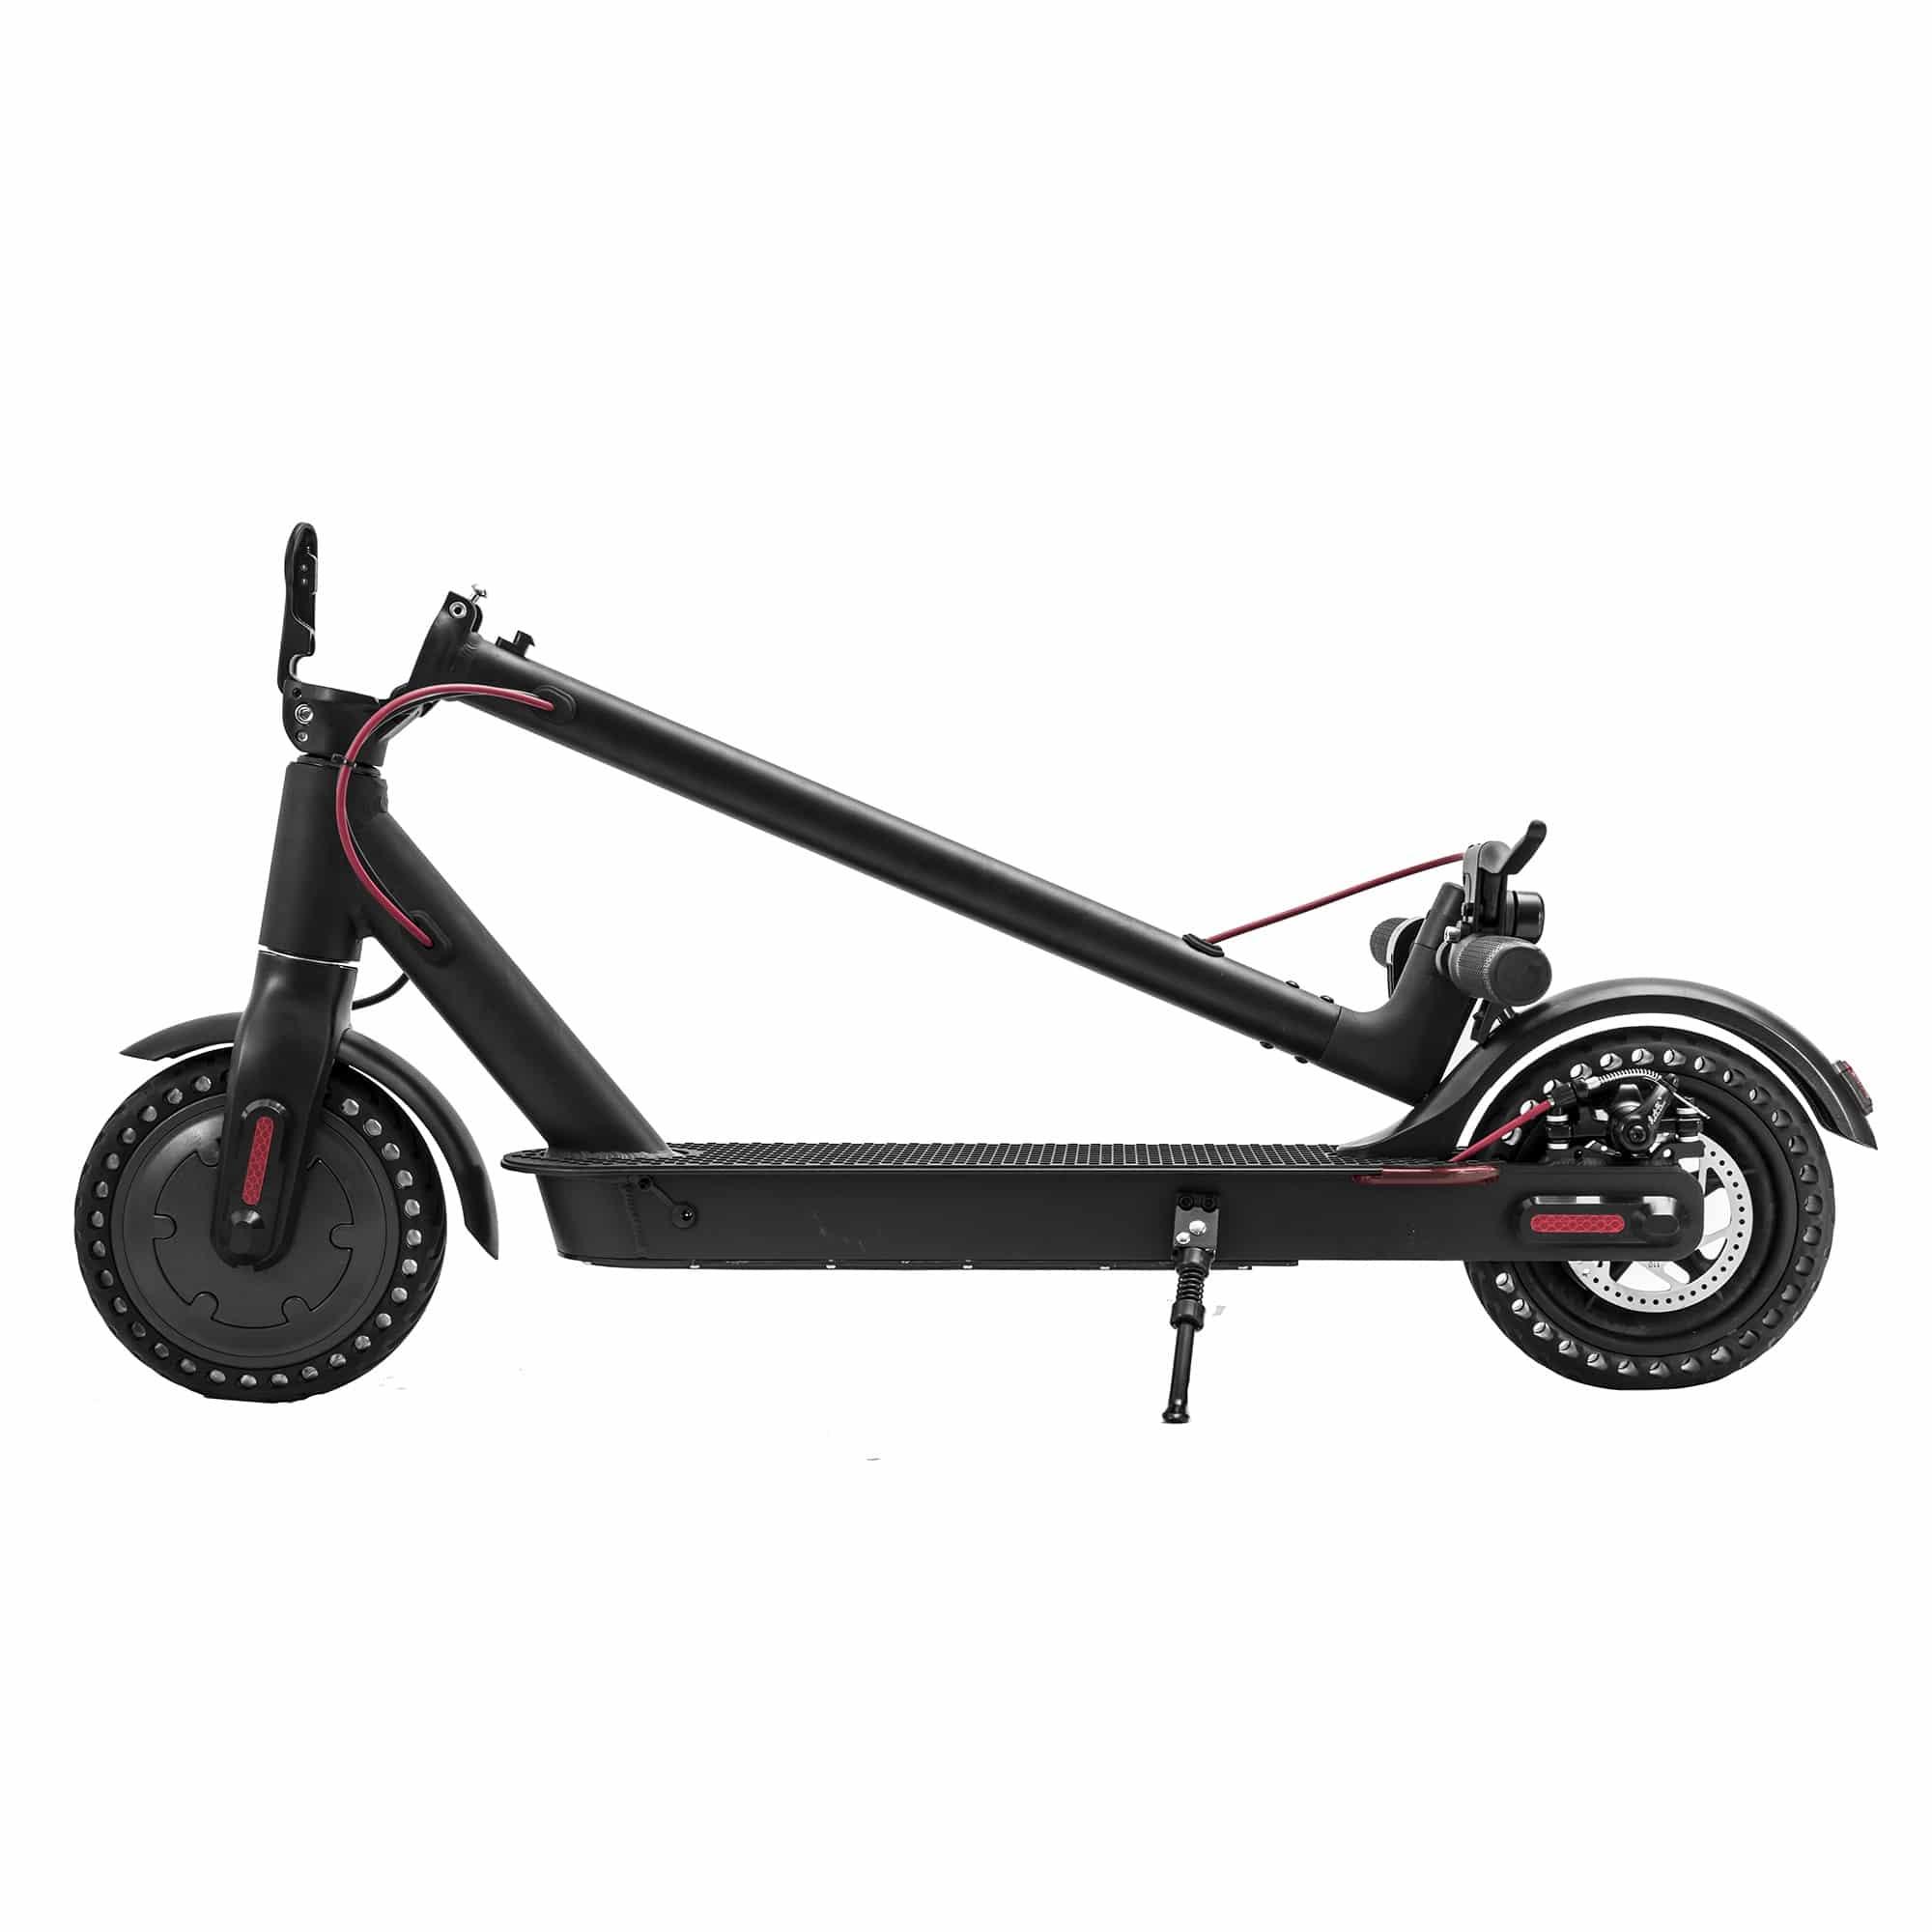 electric scooter E9 Basic folded - Zwheel